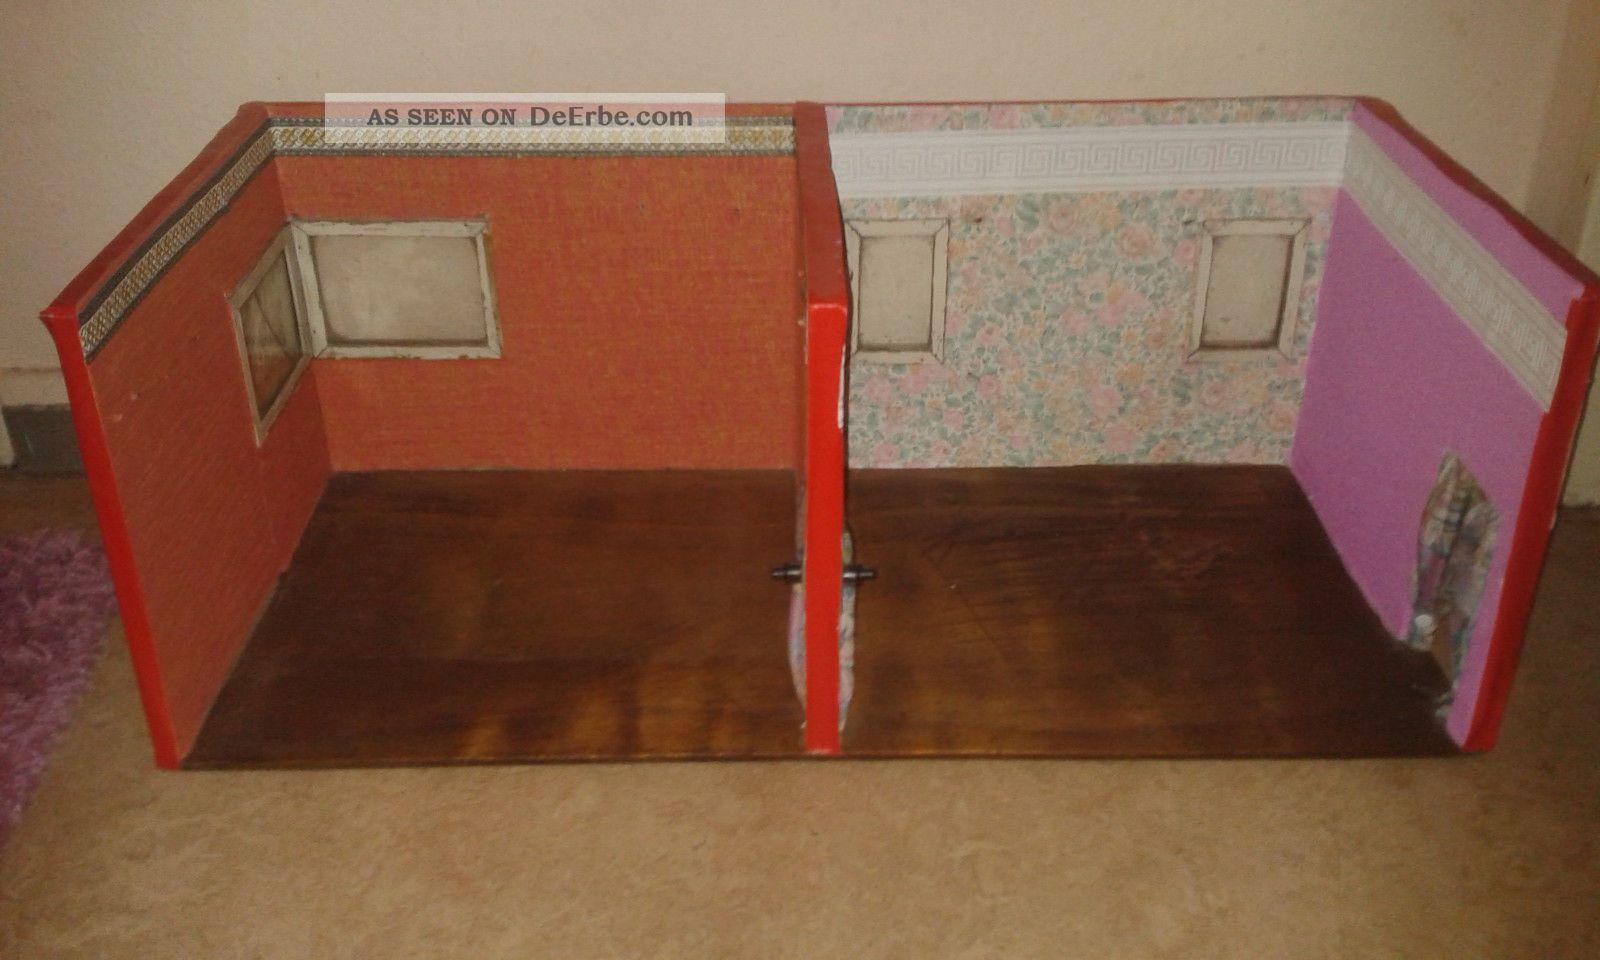 grosse alte antike zweiraum holz puppenstube bastler. Black Bedroom Furniture Sets. Home Design Ideas